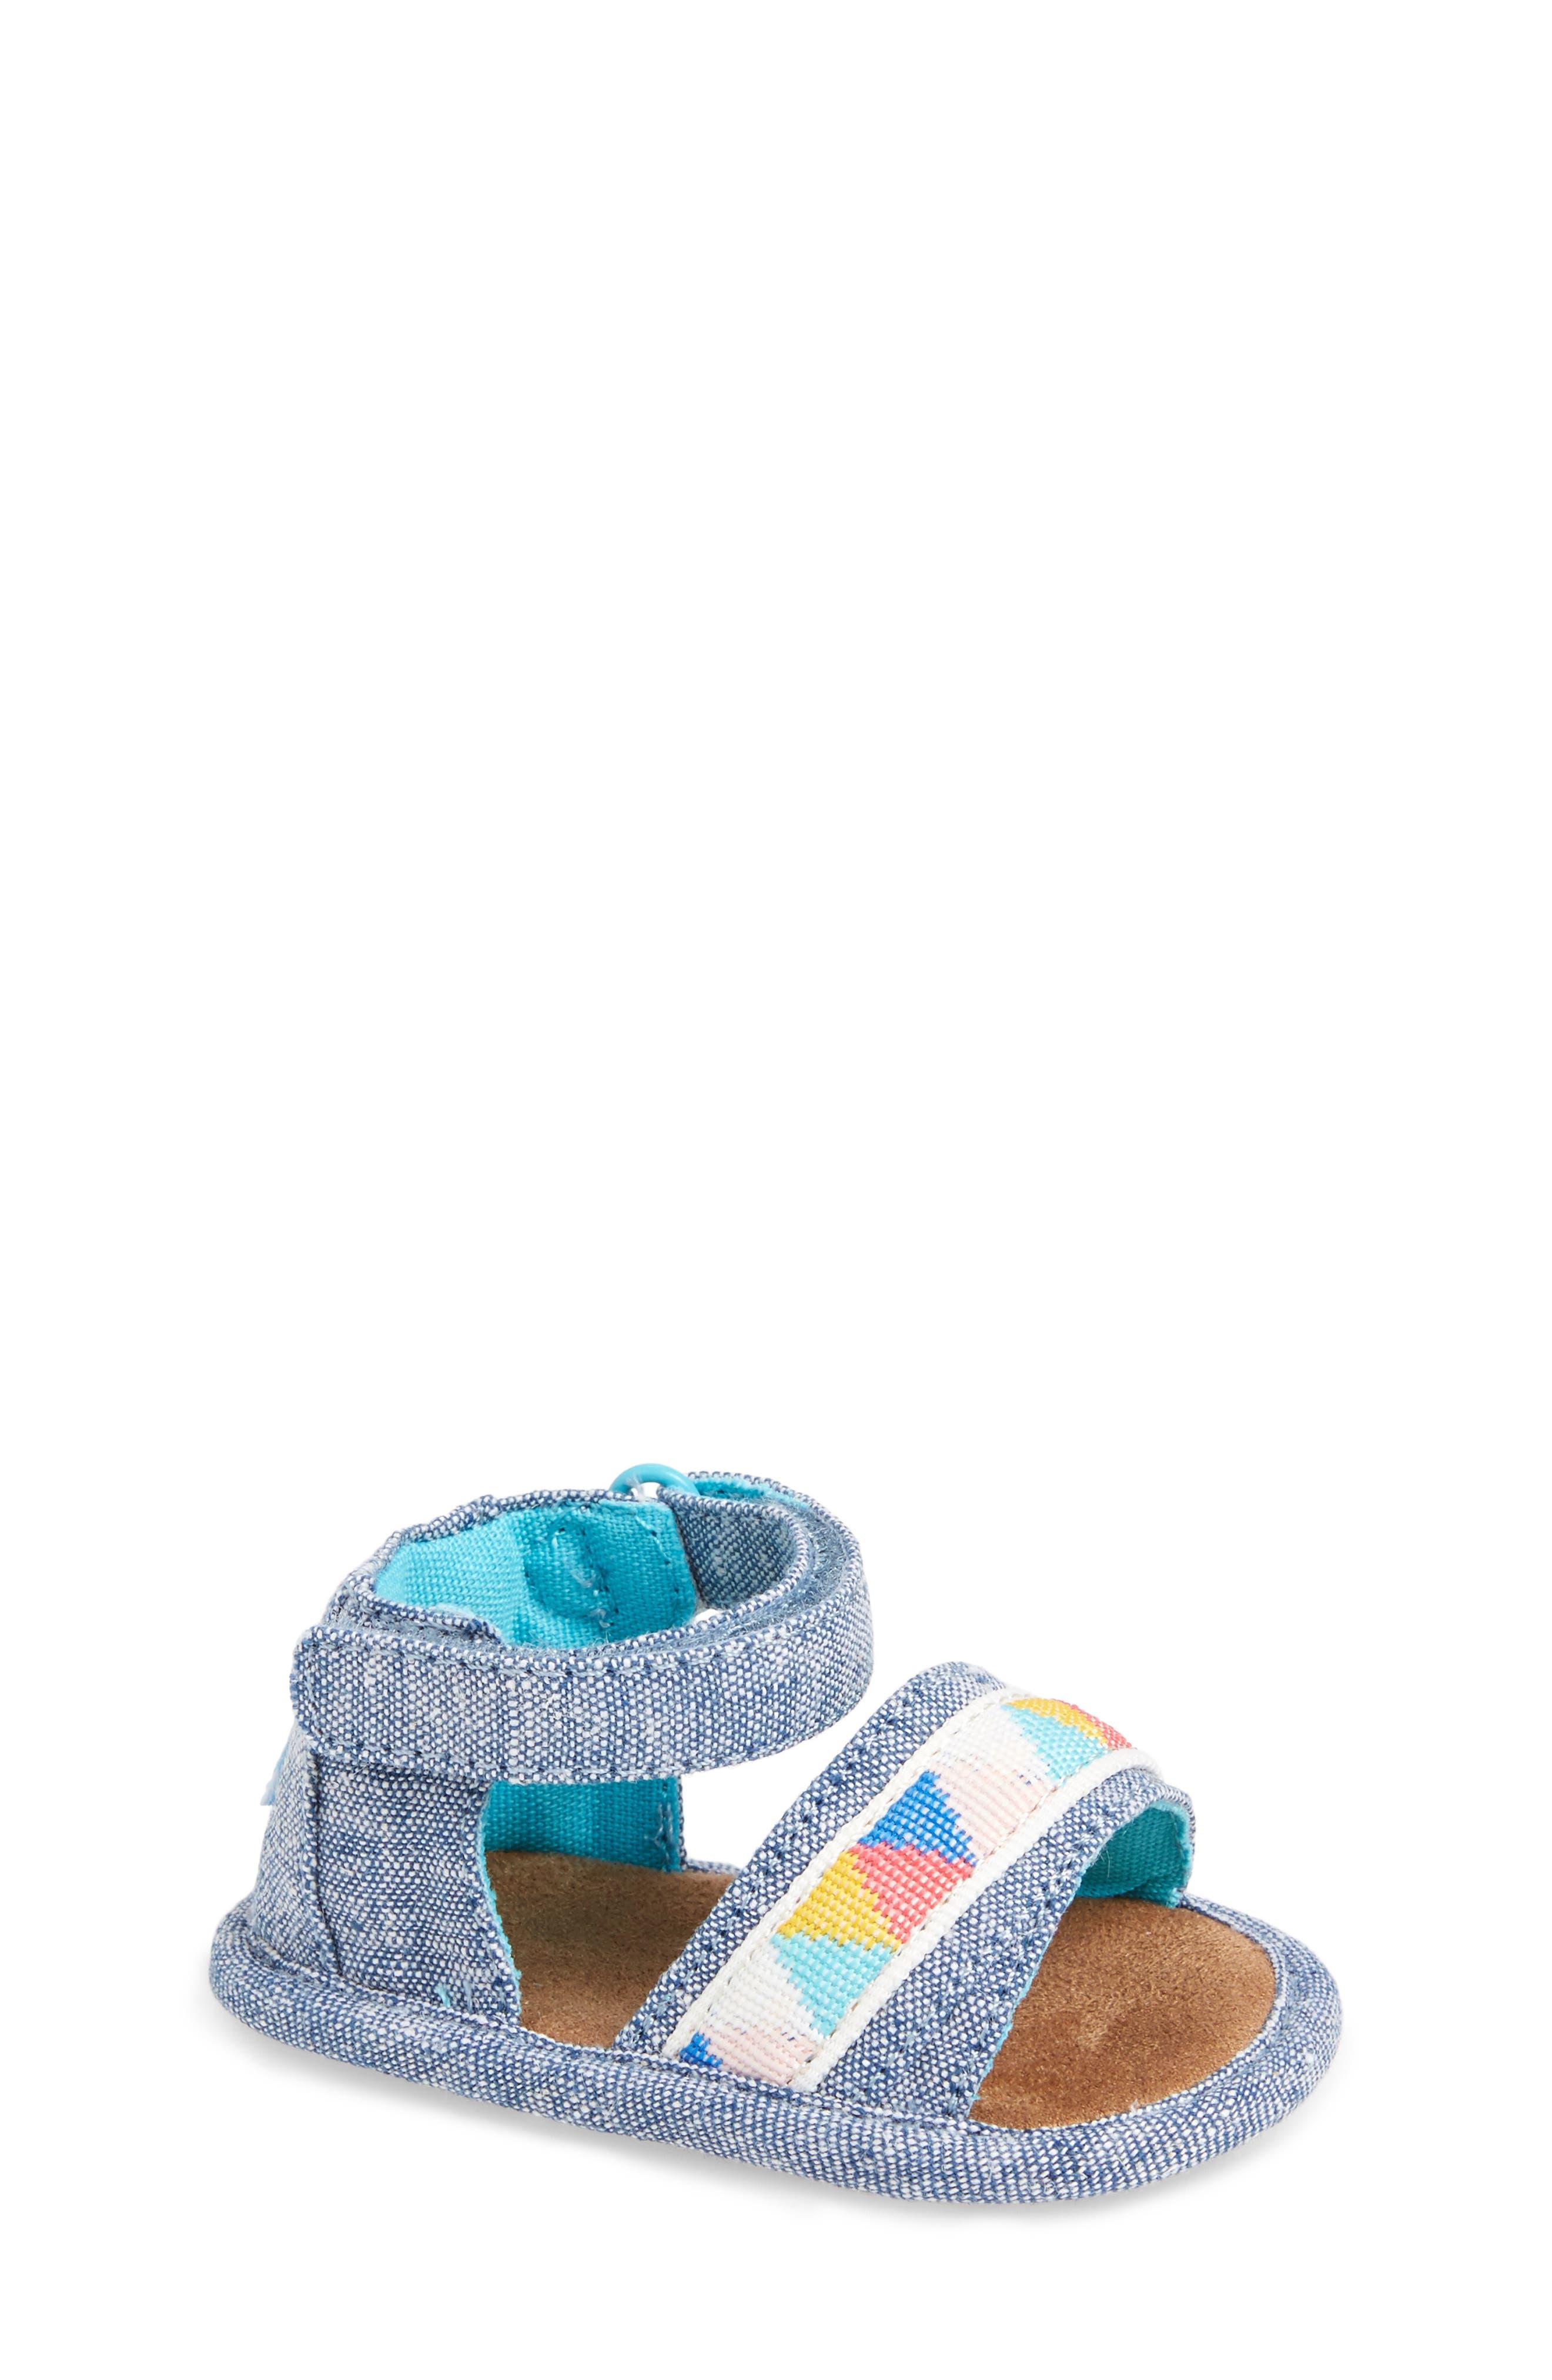 Alternate Image 1 Selected - TOMS Shiloh Sandal (Baby)